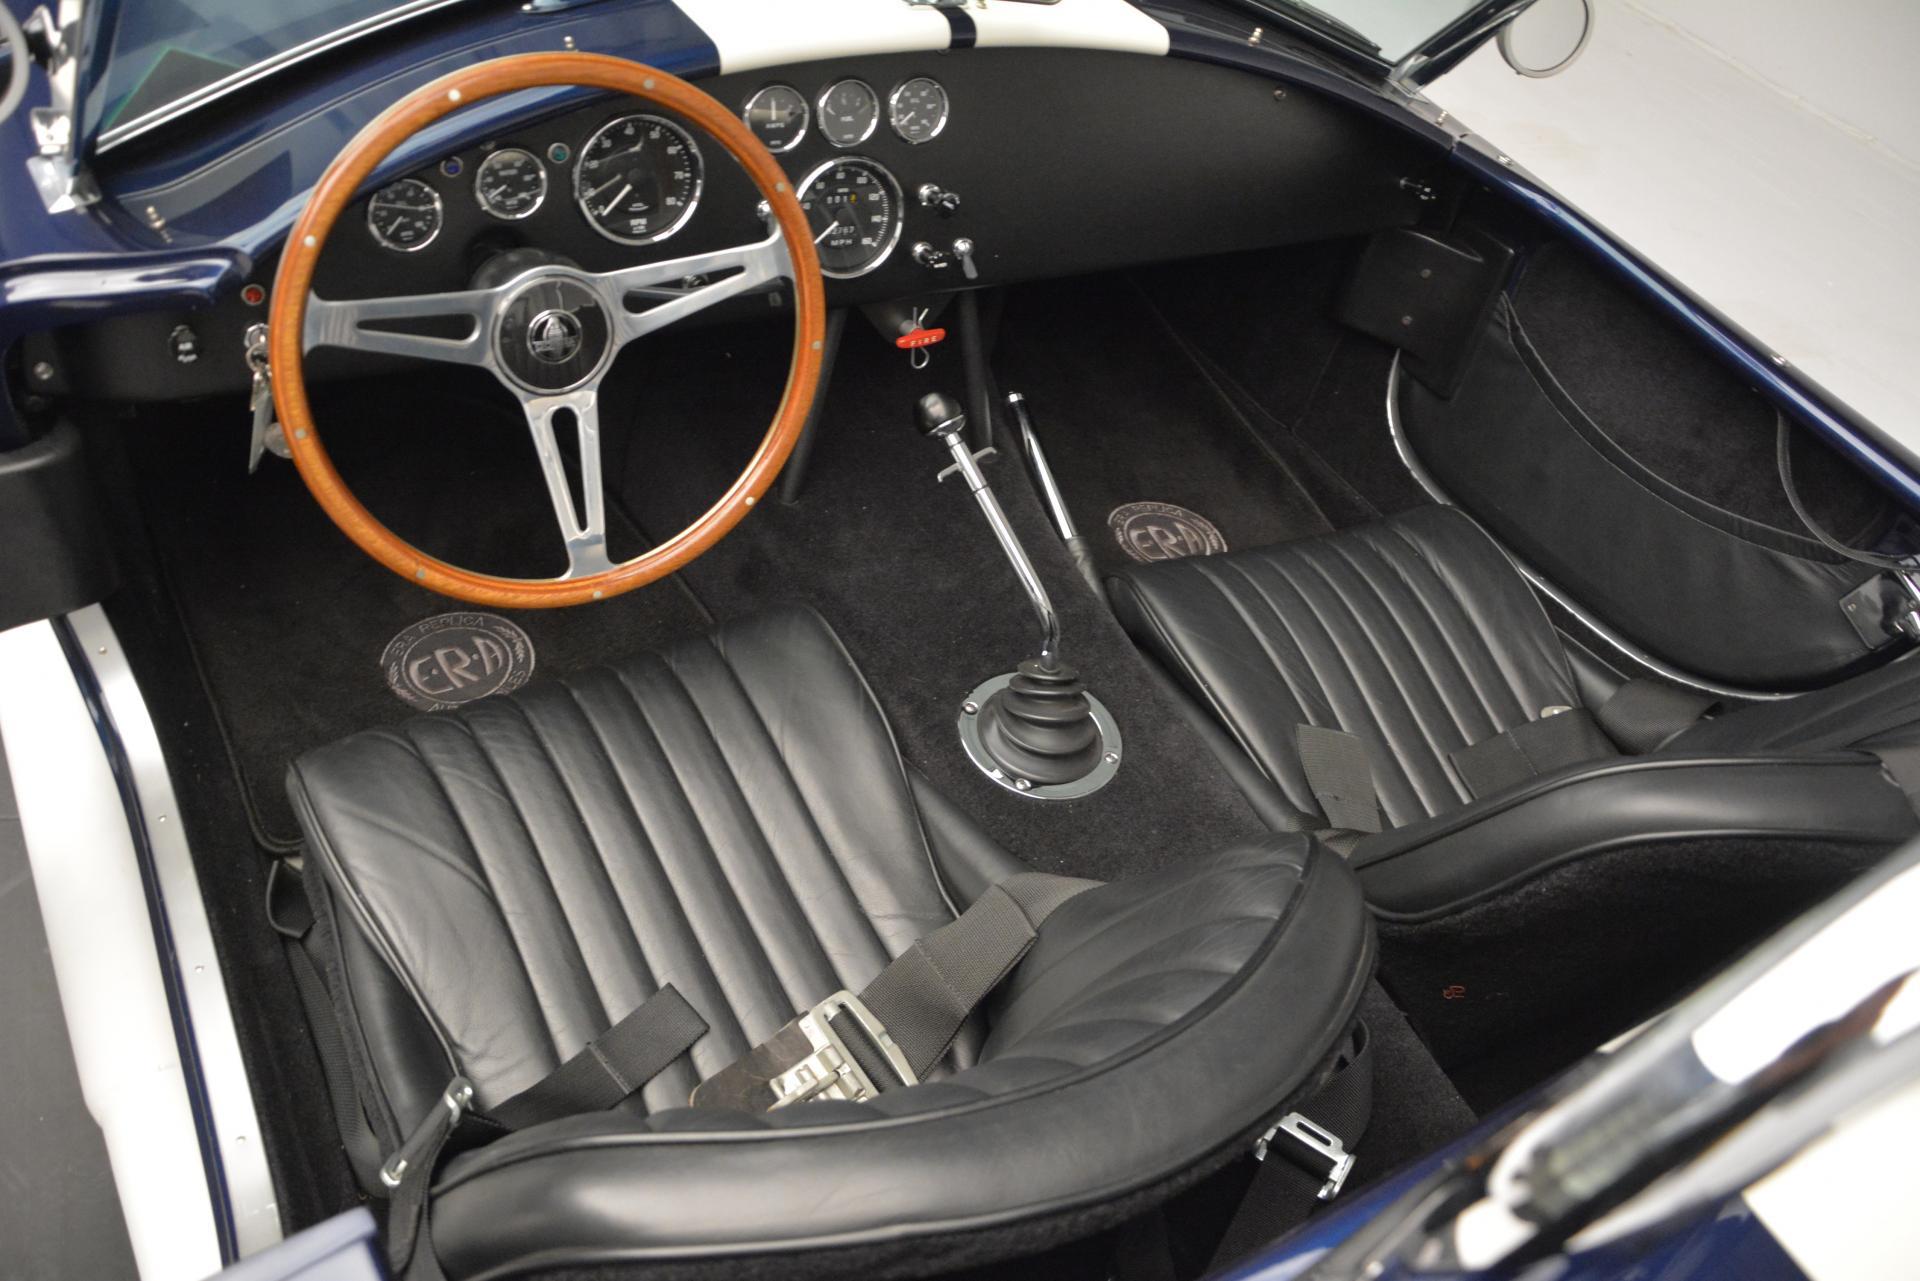 Used 2006 Ford ERA 427 SC  For Sale In Greenwich, CT. Alfa Romeo of Greenwich, 7051 107_p11